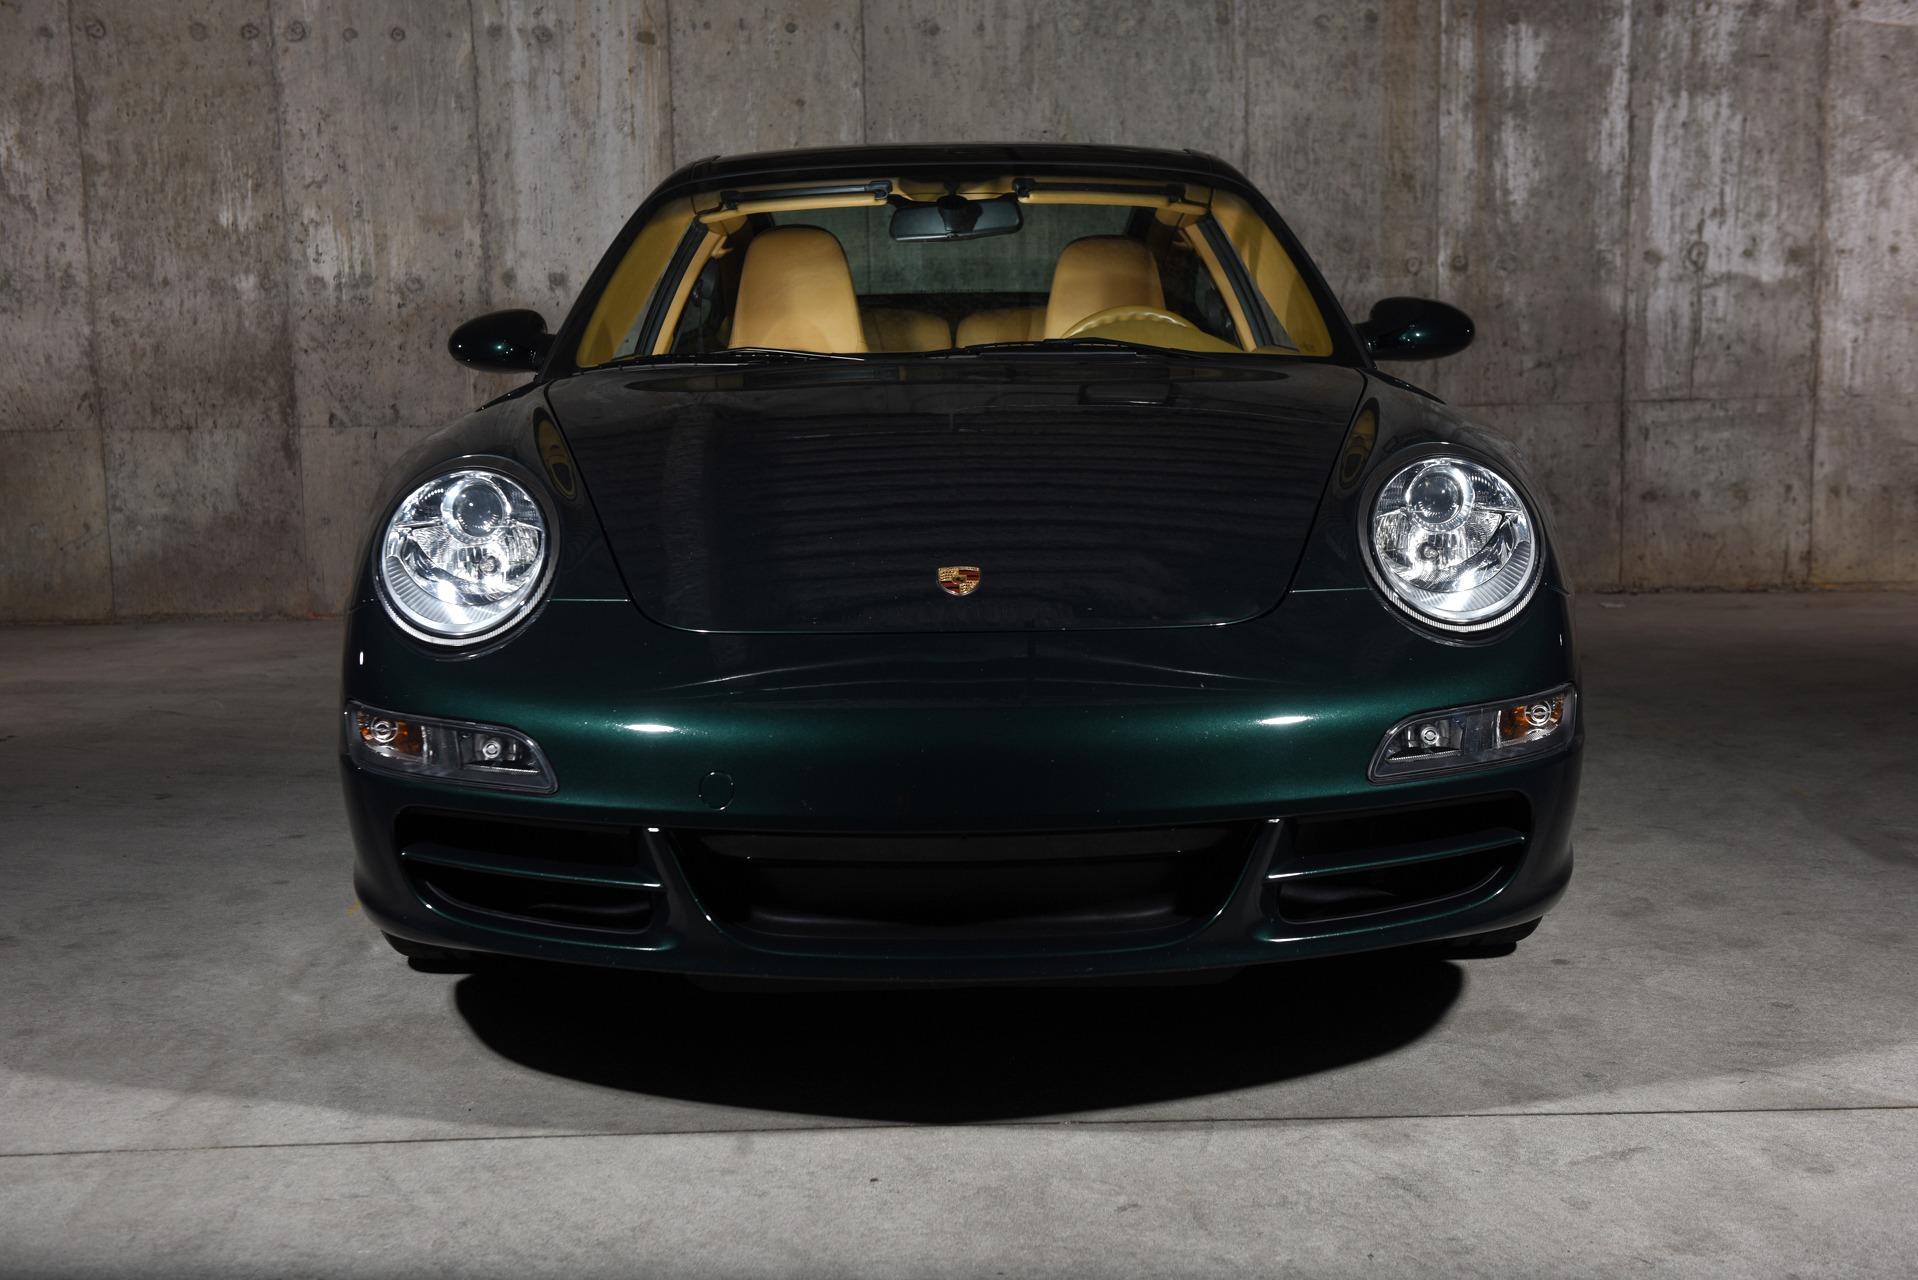 Used 2007 Porsche 911 Targa 4 | Glen Cove, NY